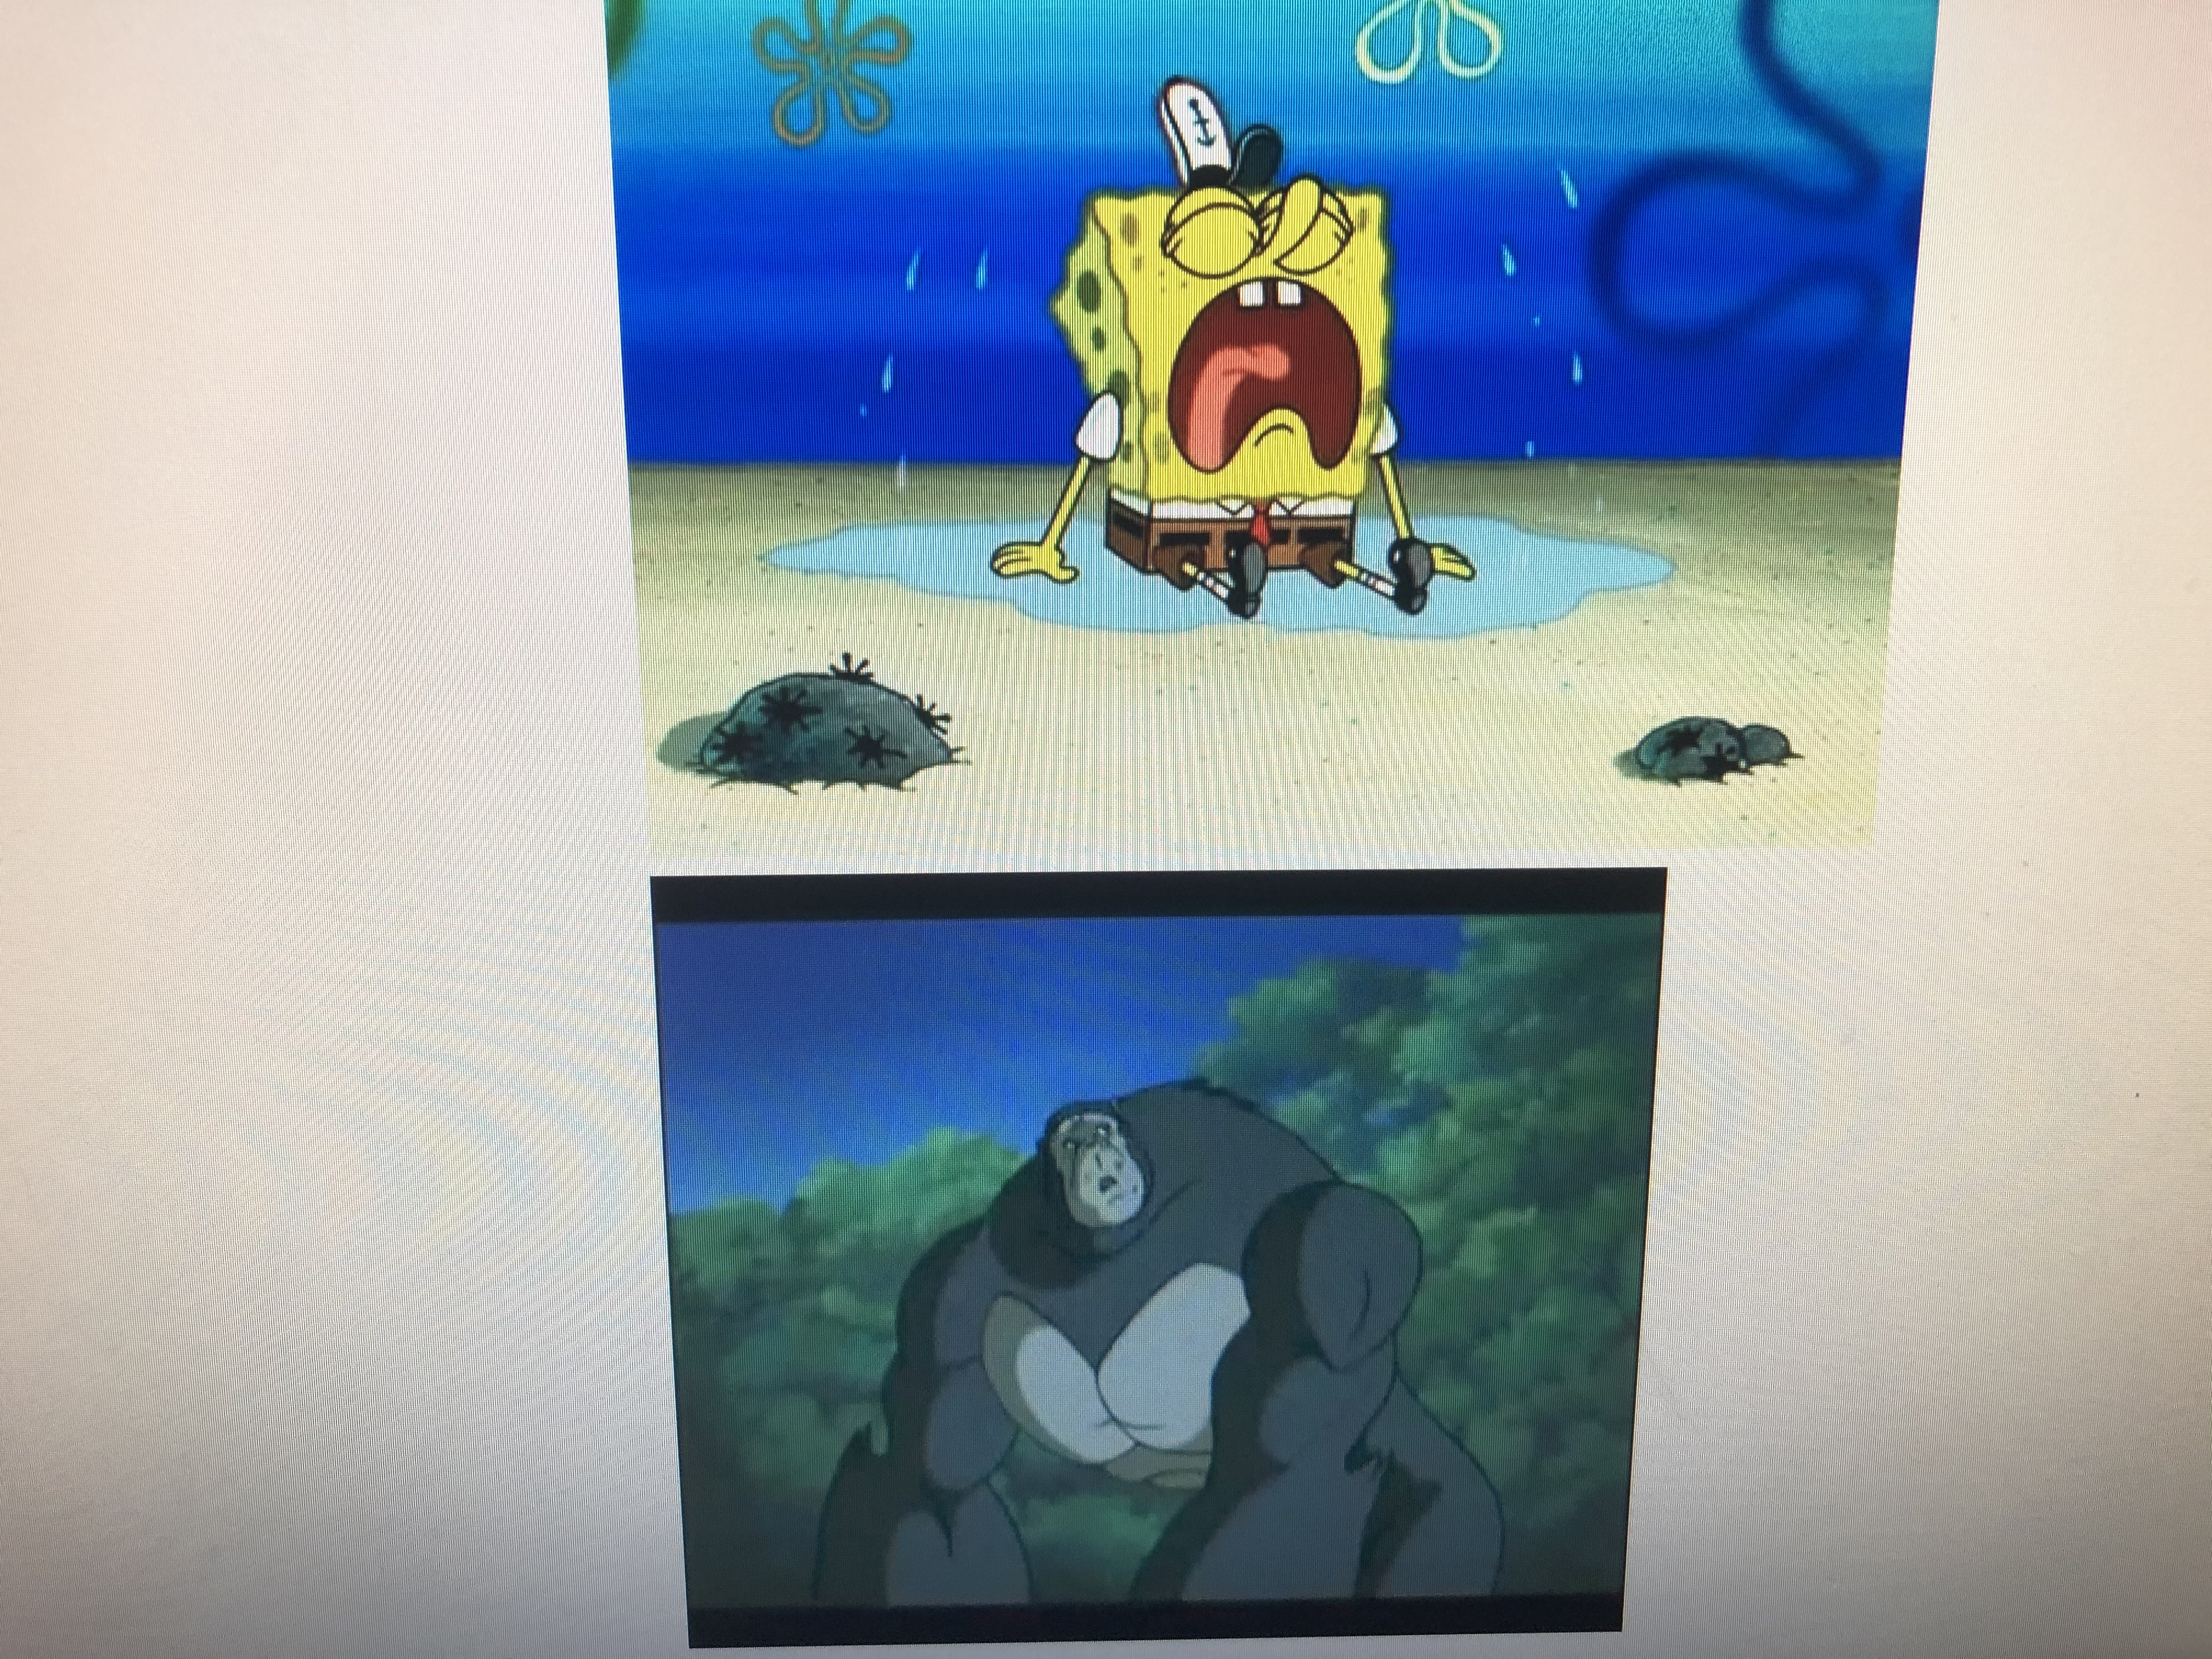 Kong Feels Bad for Spongebob